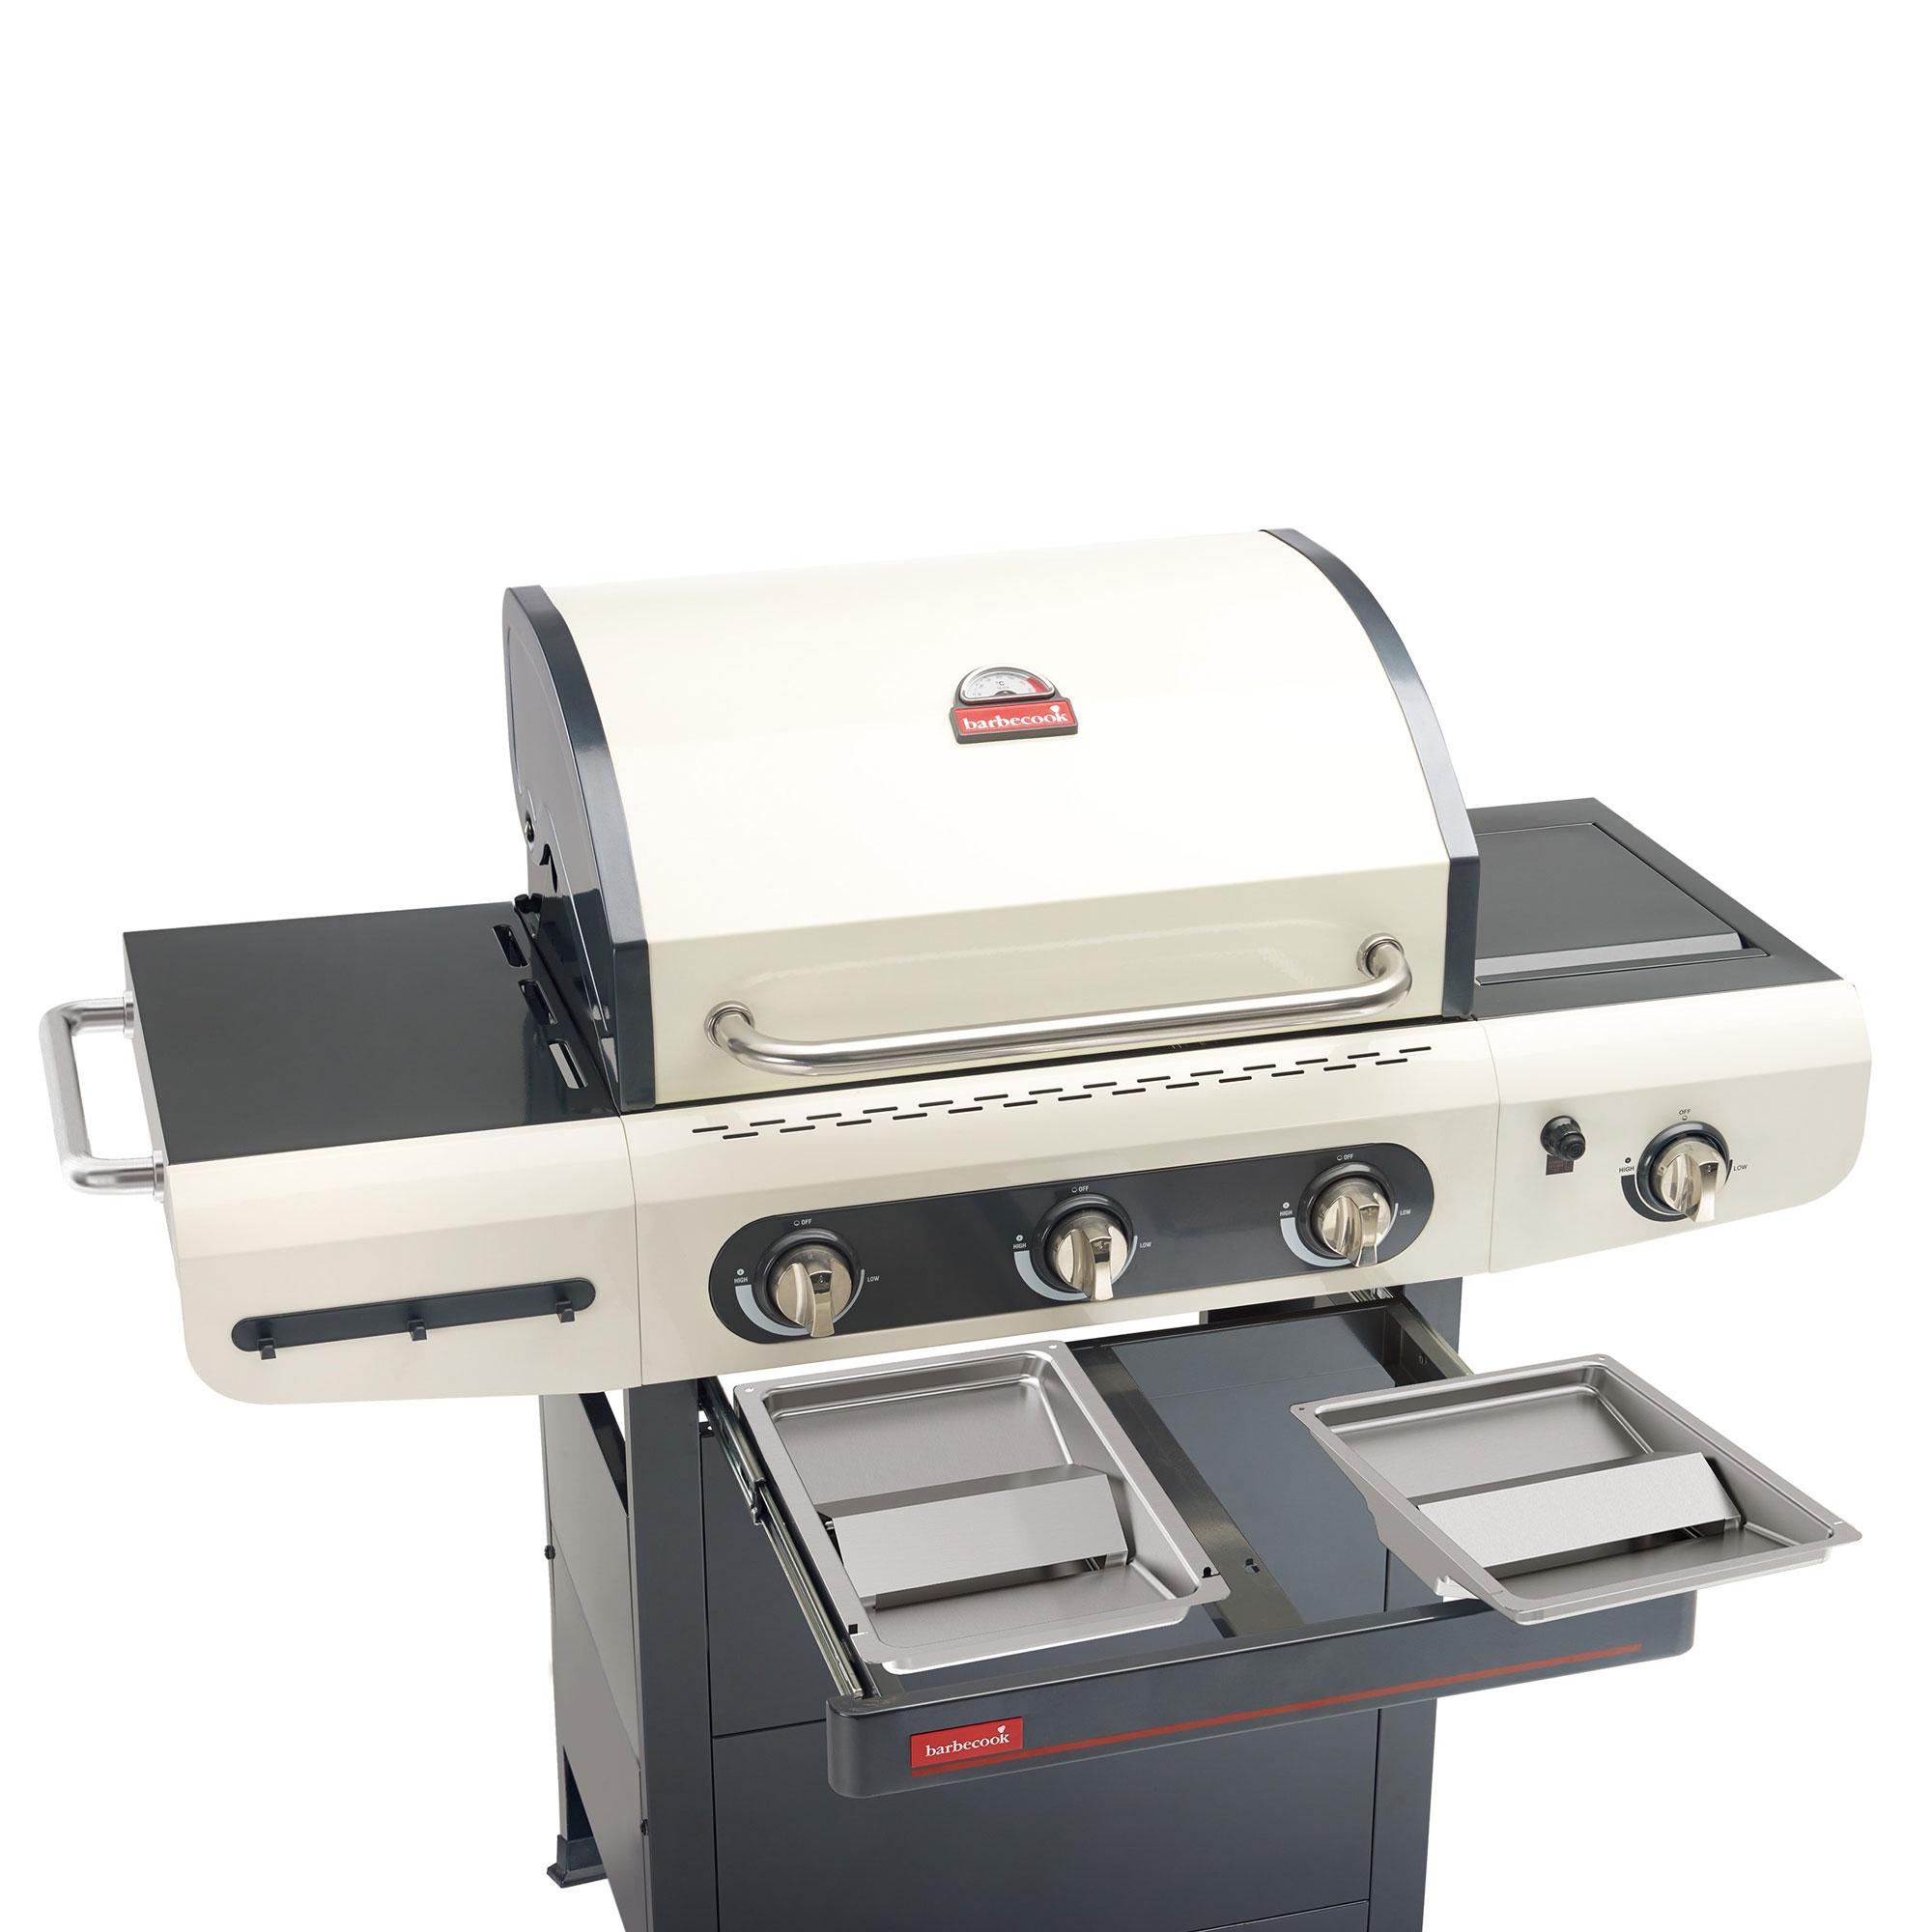 Gasgrill / Gasgrillwagen barbecook Siesta 310 creme m. Plancha 62x43cm Bild 3